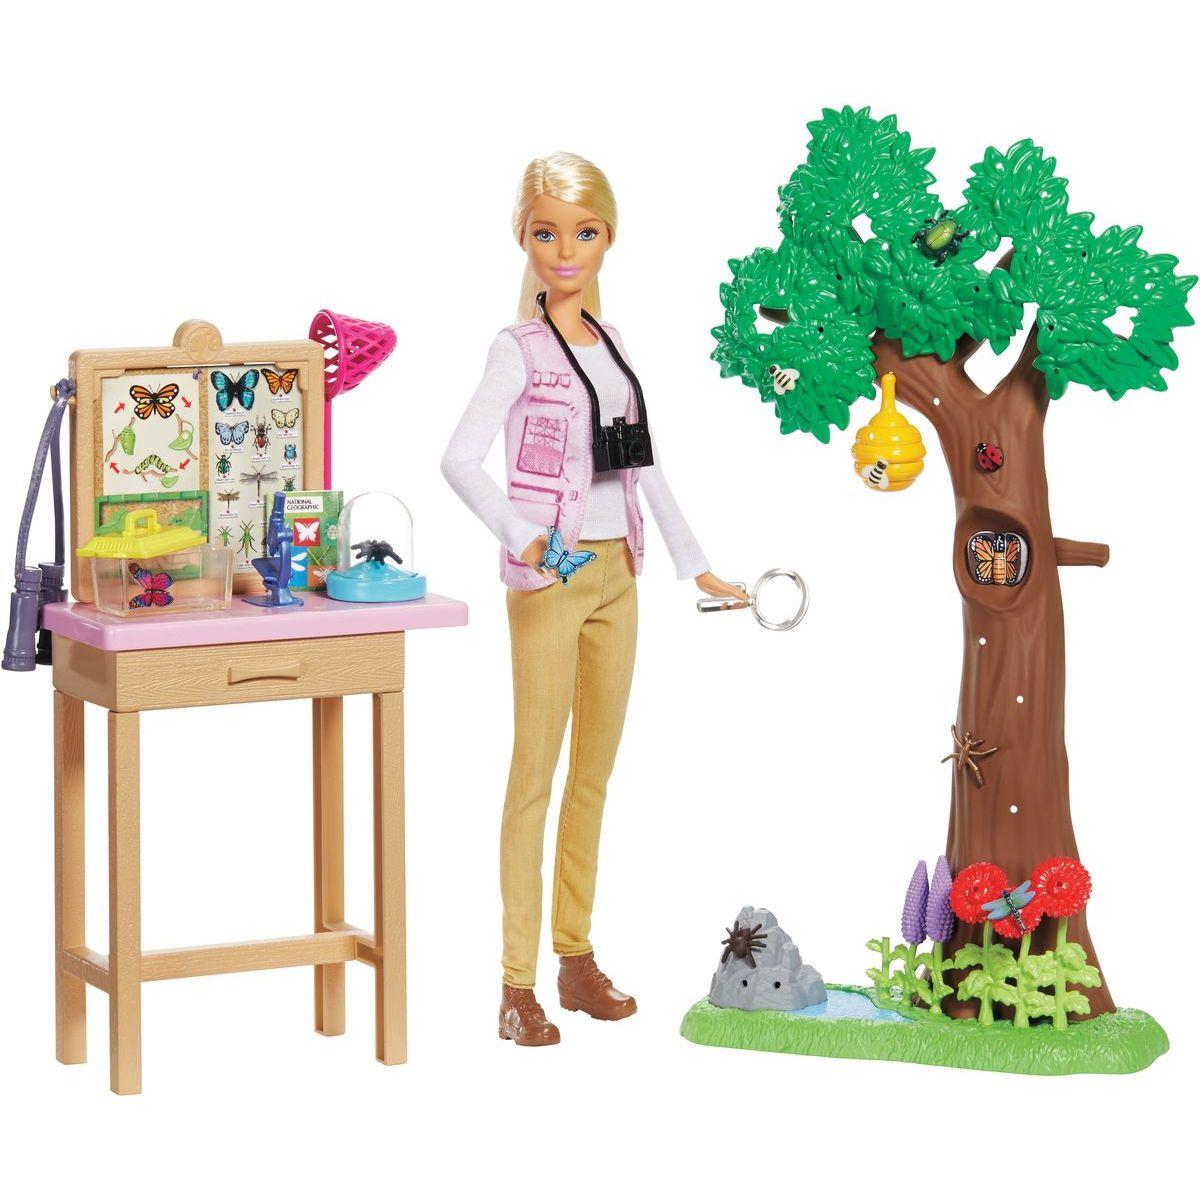 Mattel Barbie entomoložka National Geographic herní set